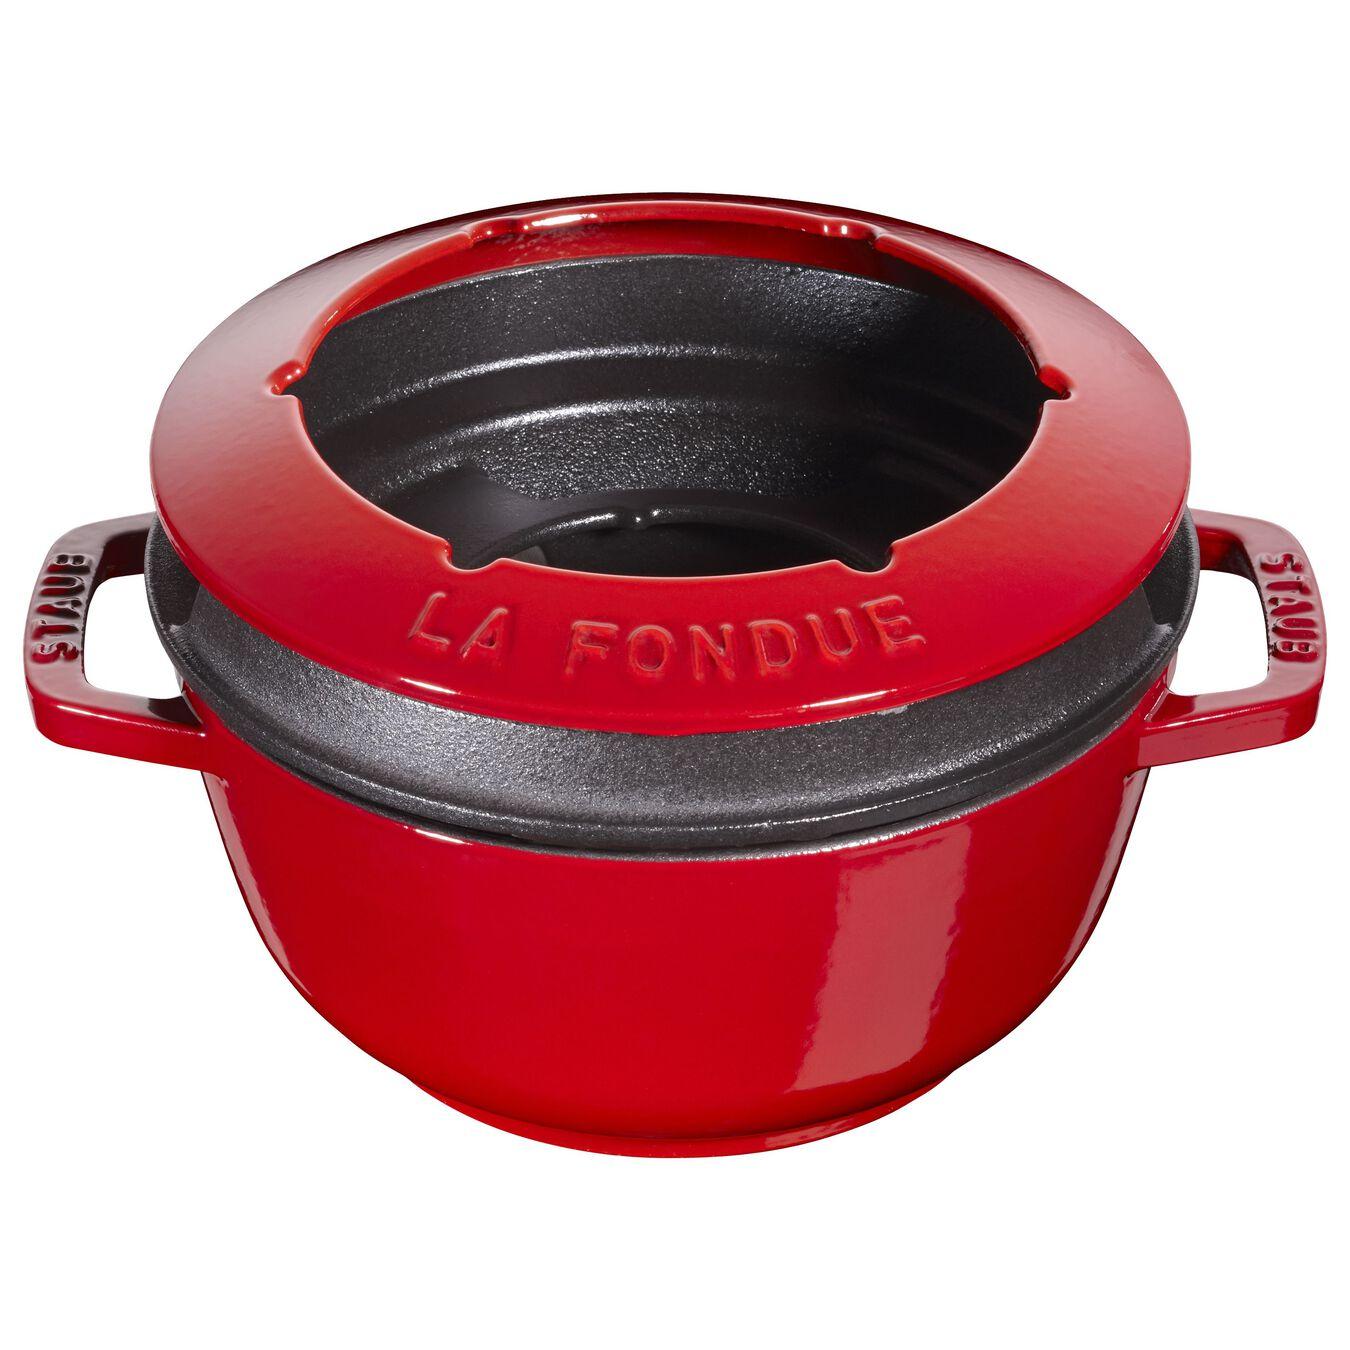 Service à fondue 18 cm, Cerise,,large 5